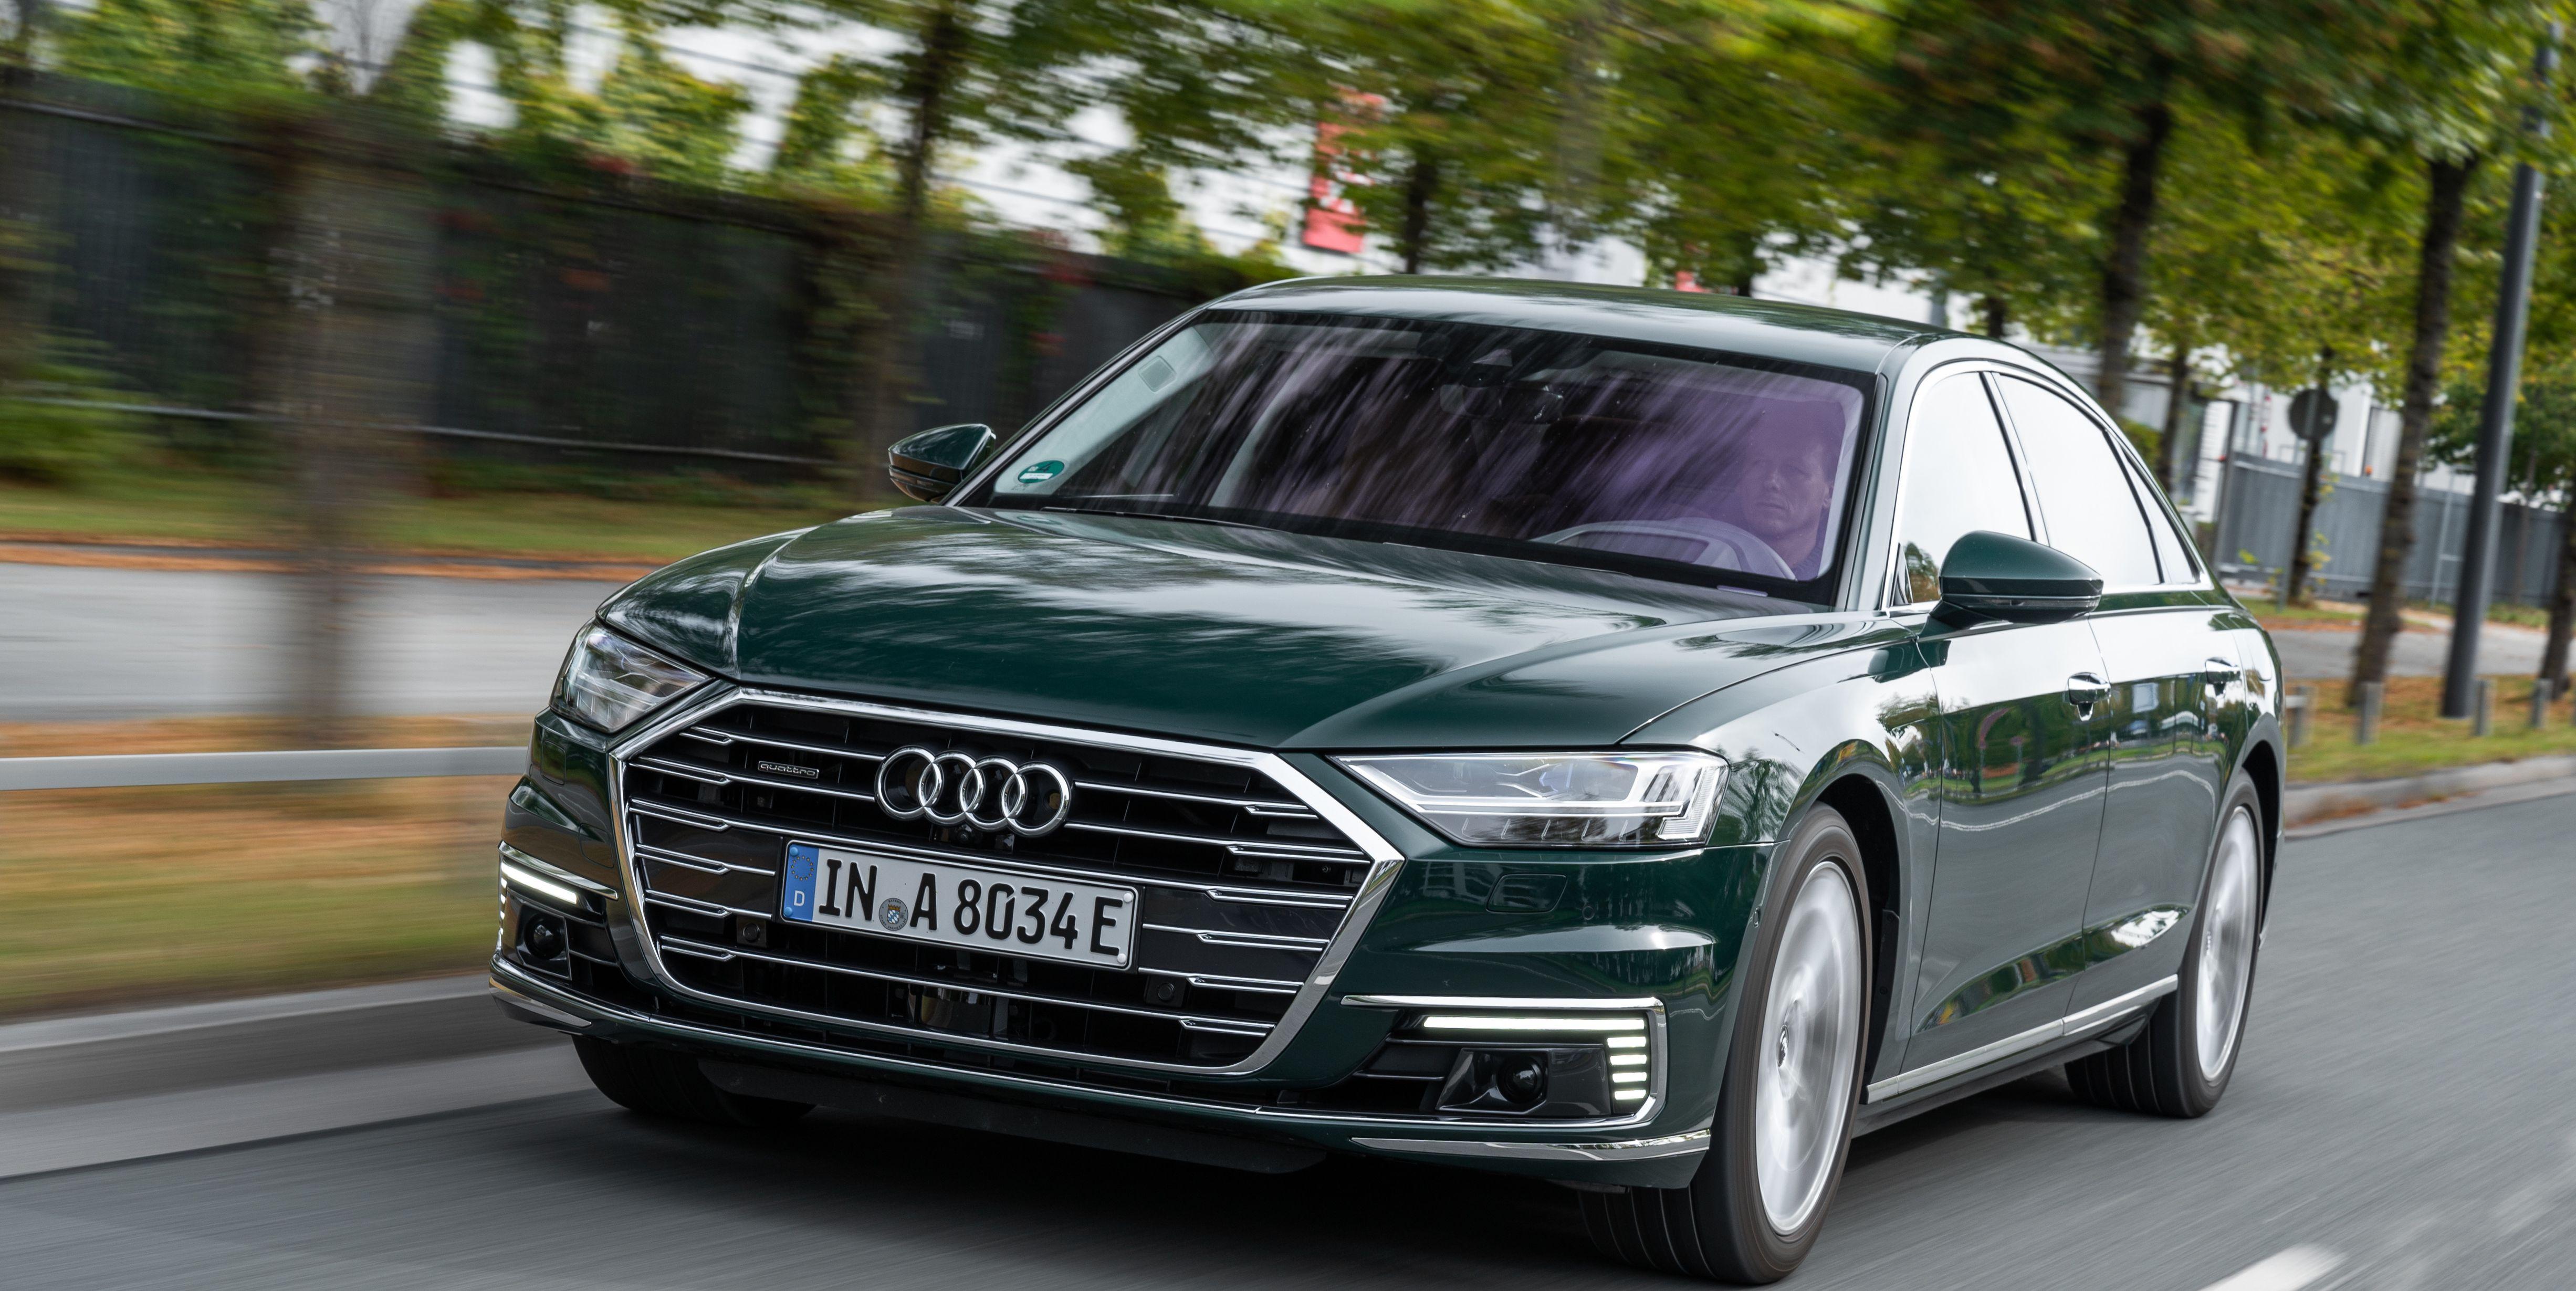 2021 Audi A8 Picture